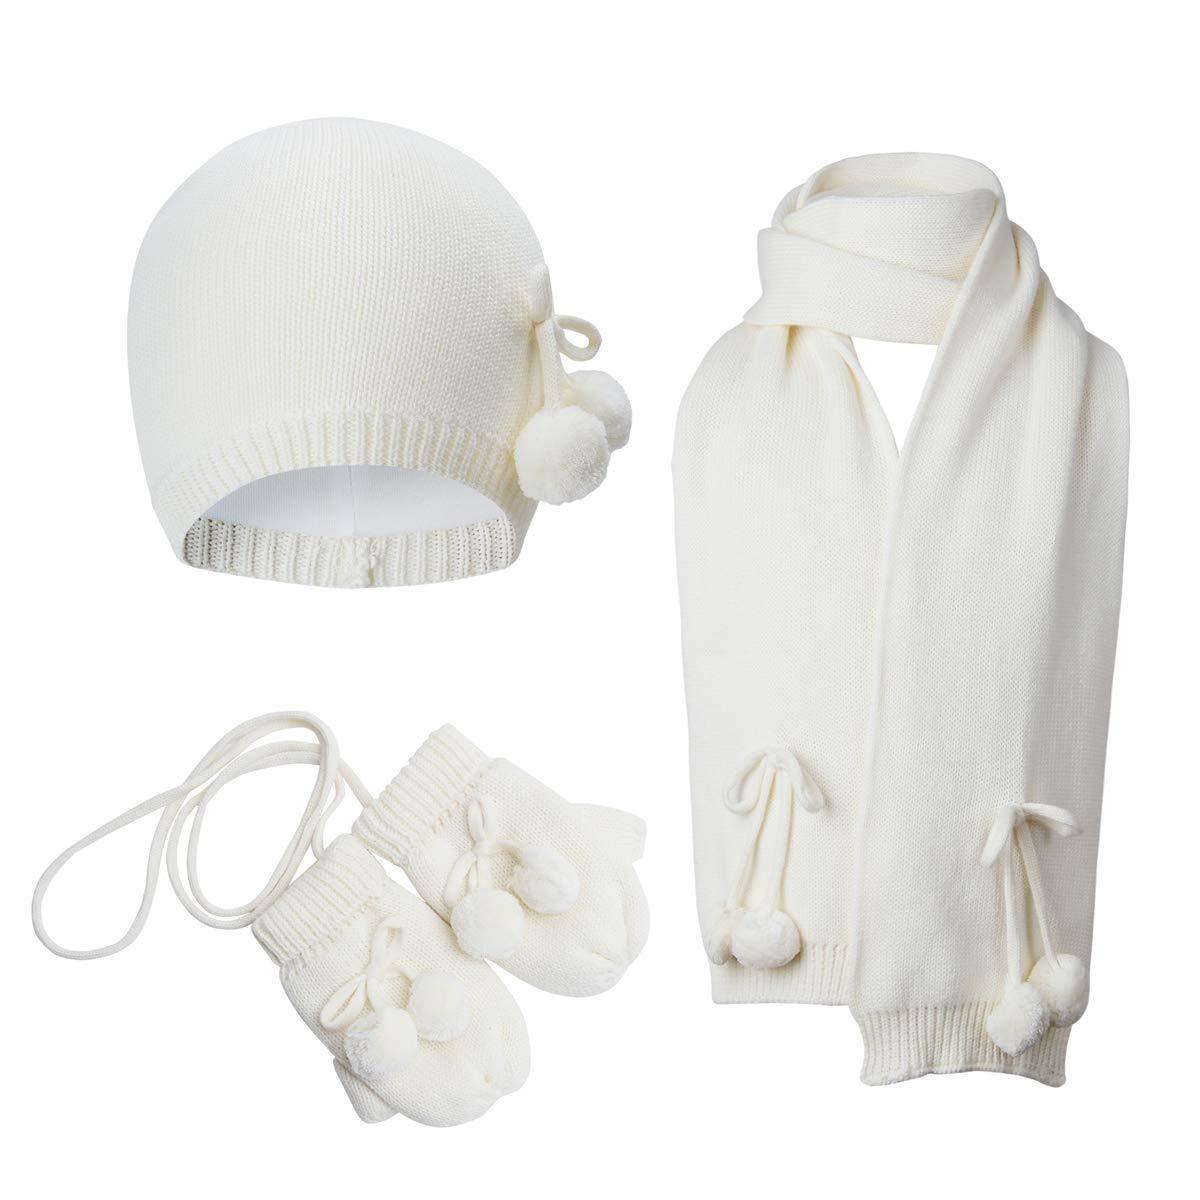 Vivobiniya Toddler Baby Girl Hat Scarf Gloves 3pcs/Set 0-4years Old Cream (2-4years Old(18.8-20.4in), hat1+Scarf+ Gloves) 6624